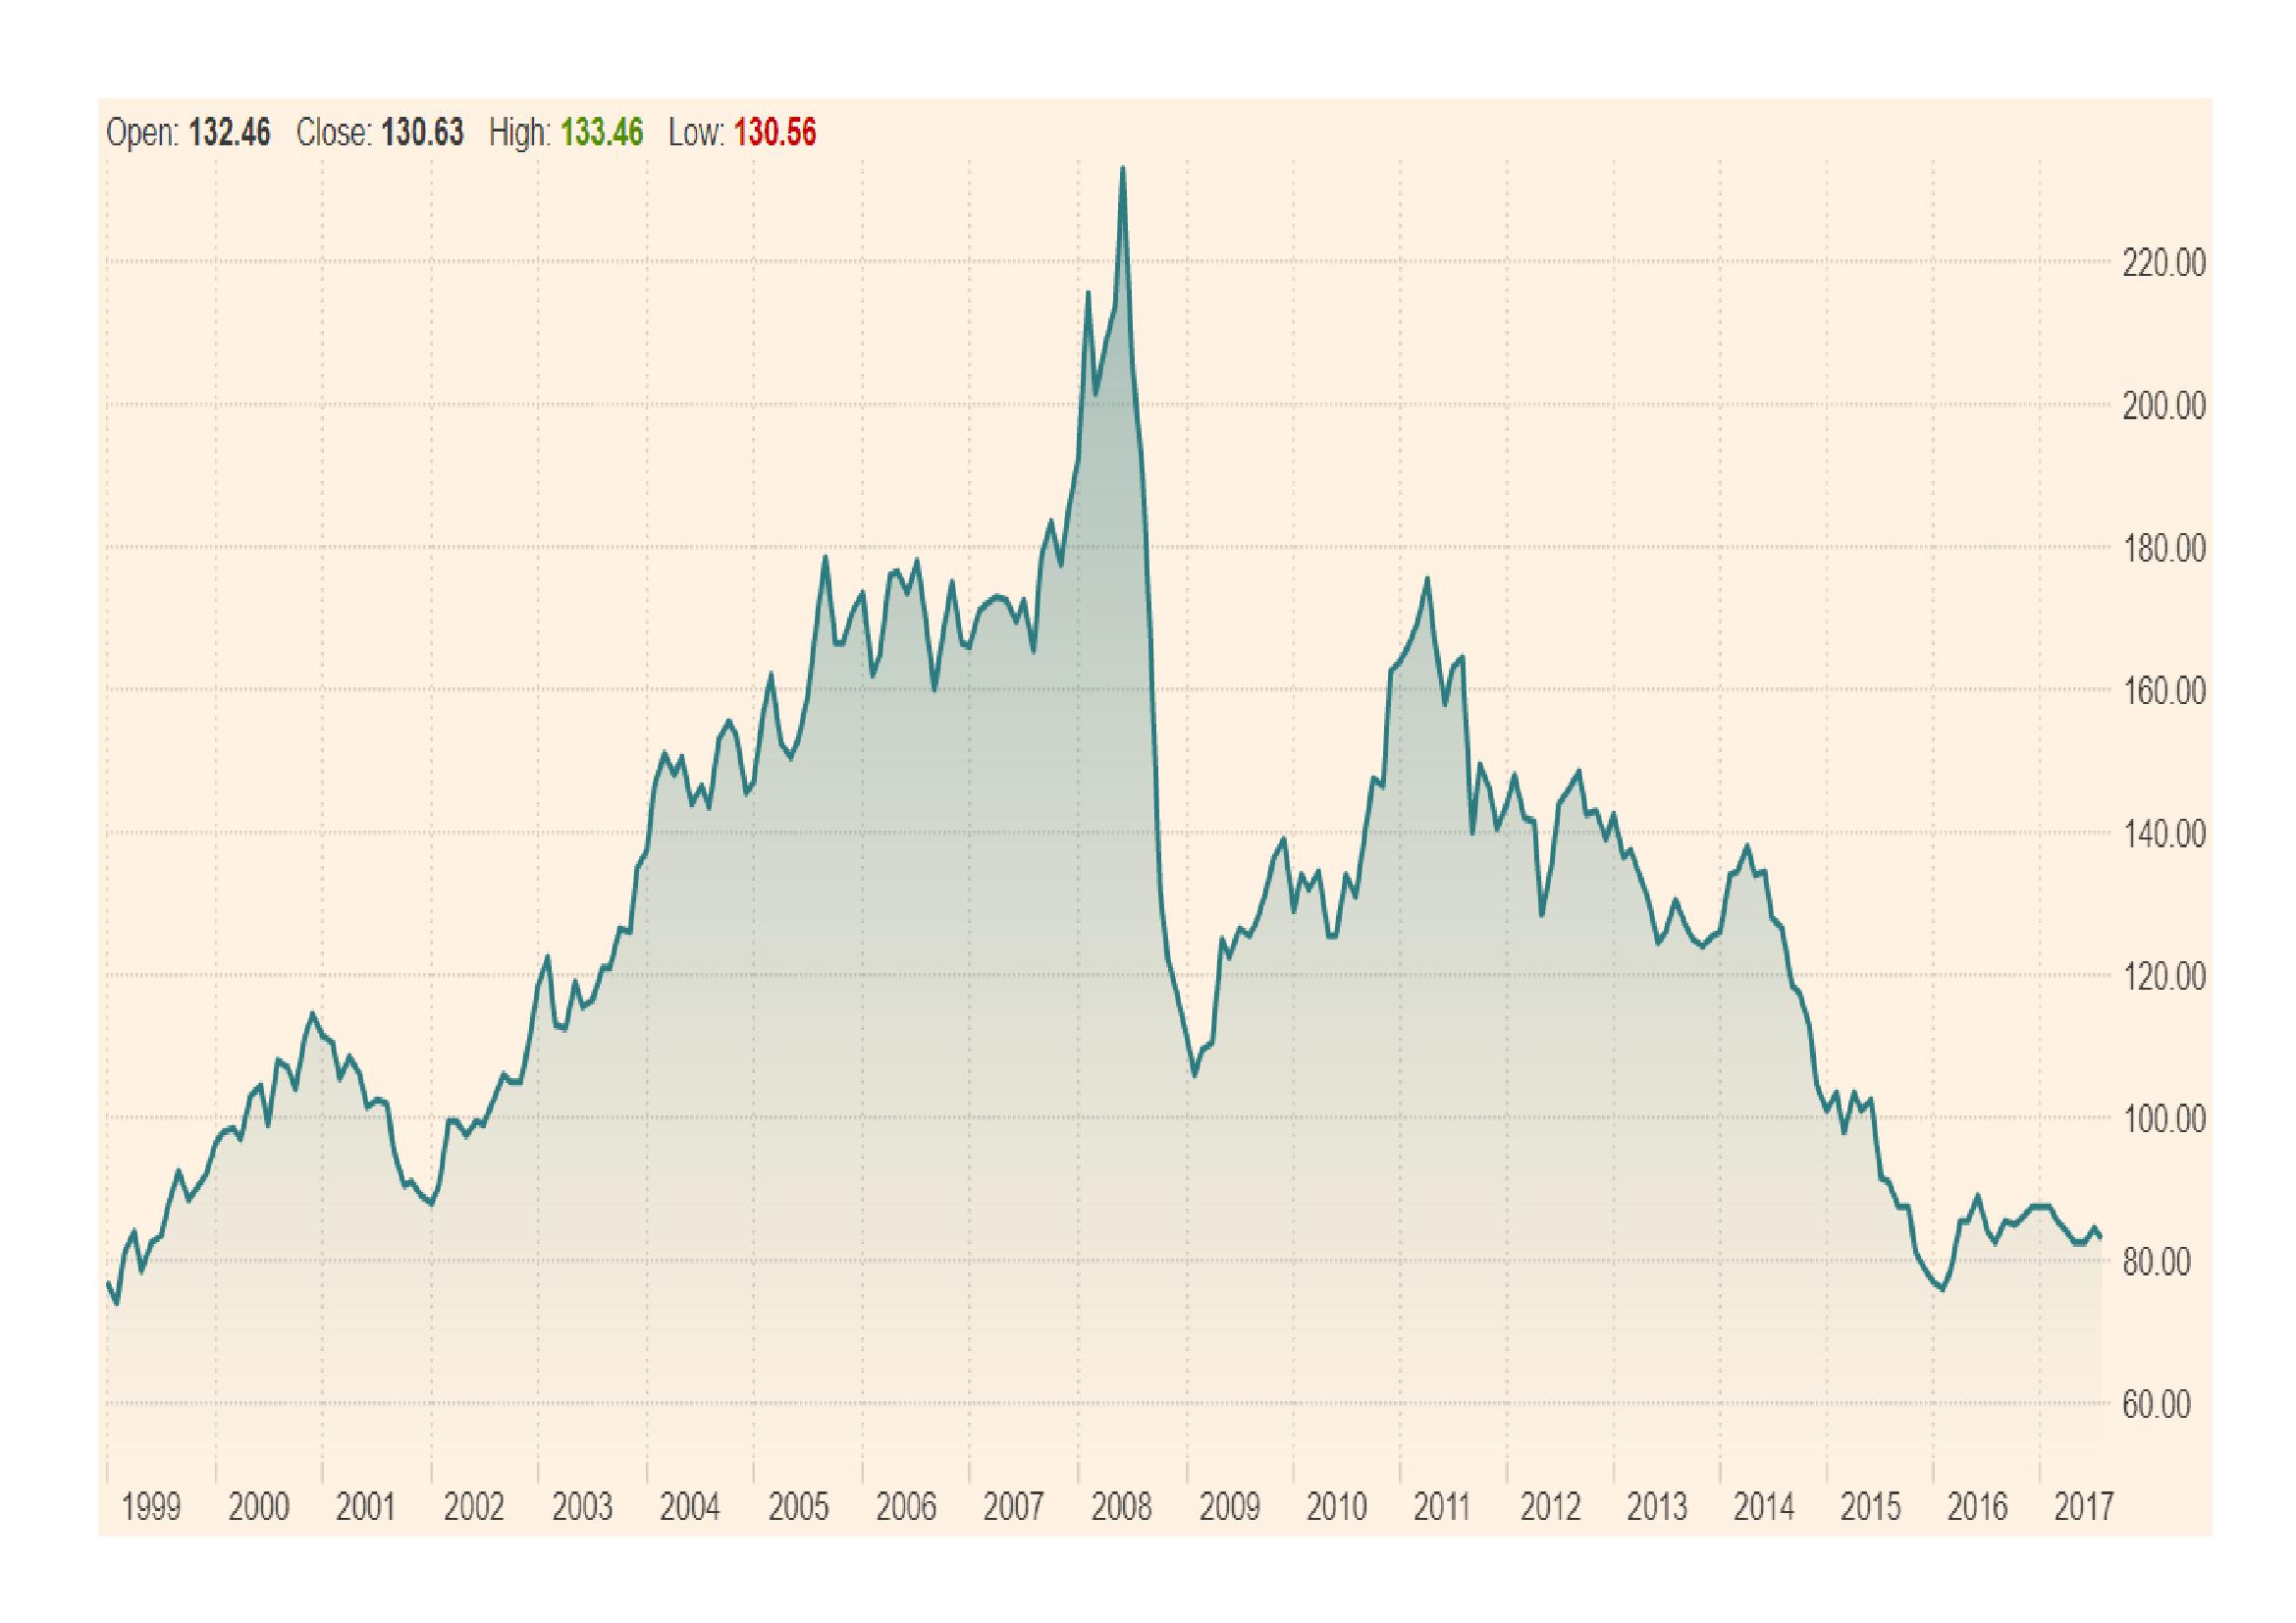 Bloomberg_Commodity_Index_-_Jan_1999_-_Aug_2017